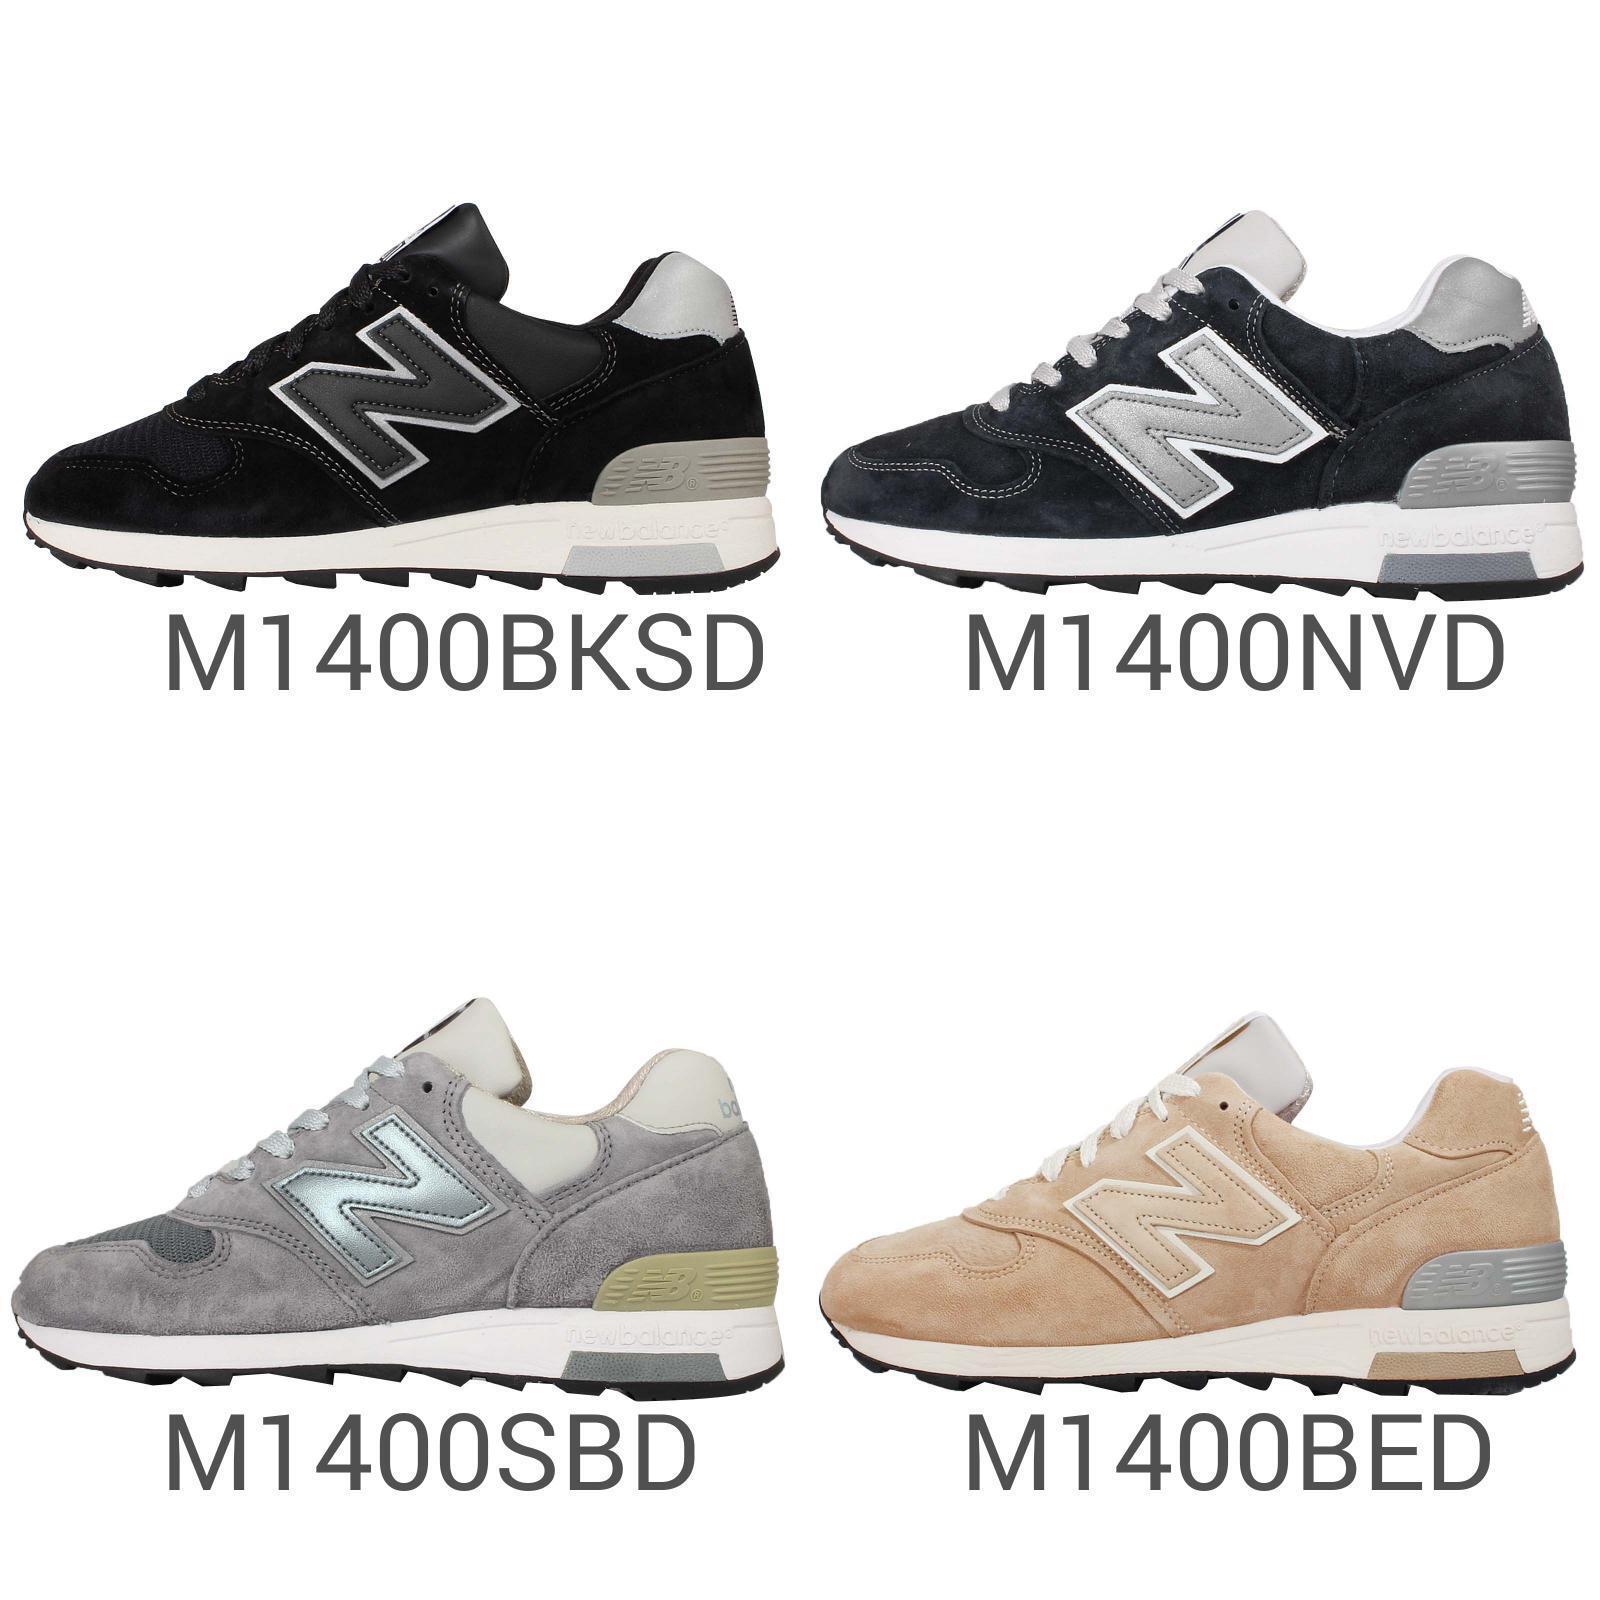 New Balance M1400 D Made In USA Mens Running scarpe scarpe da ginnastica Pick 1